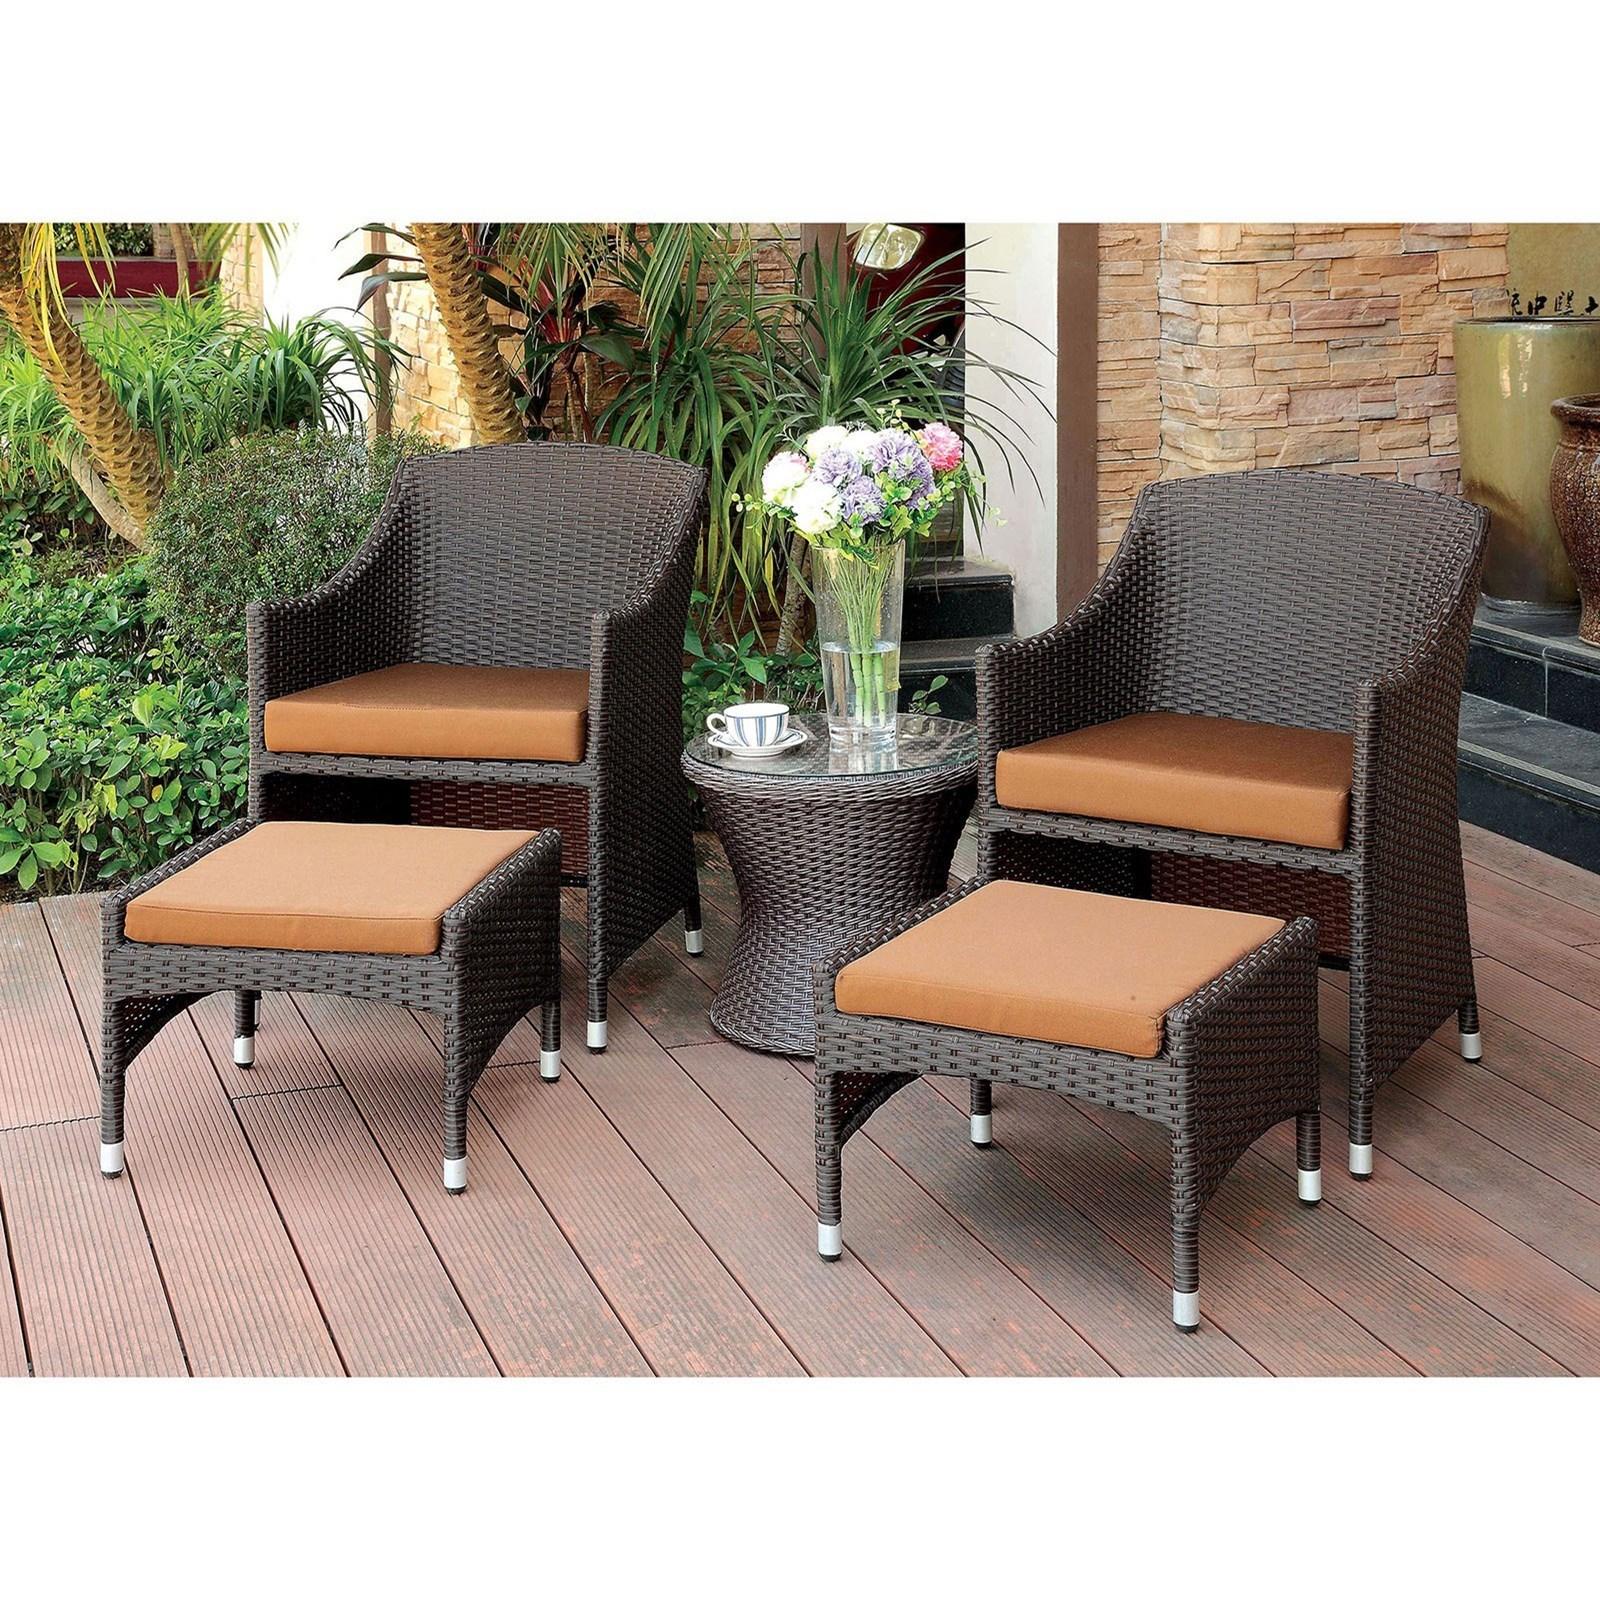 3 Pc. Patio Chair Set